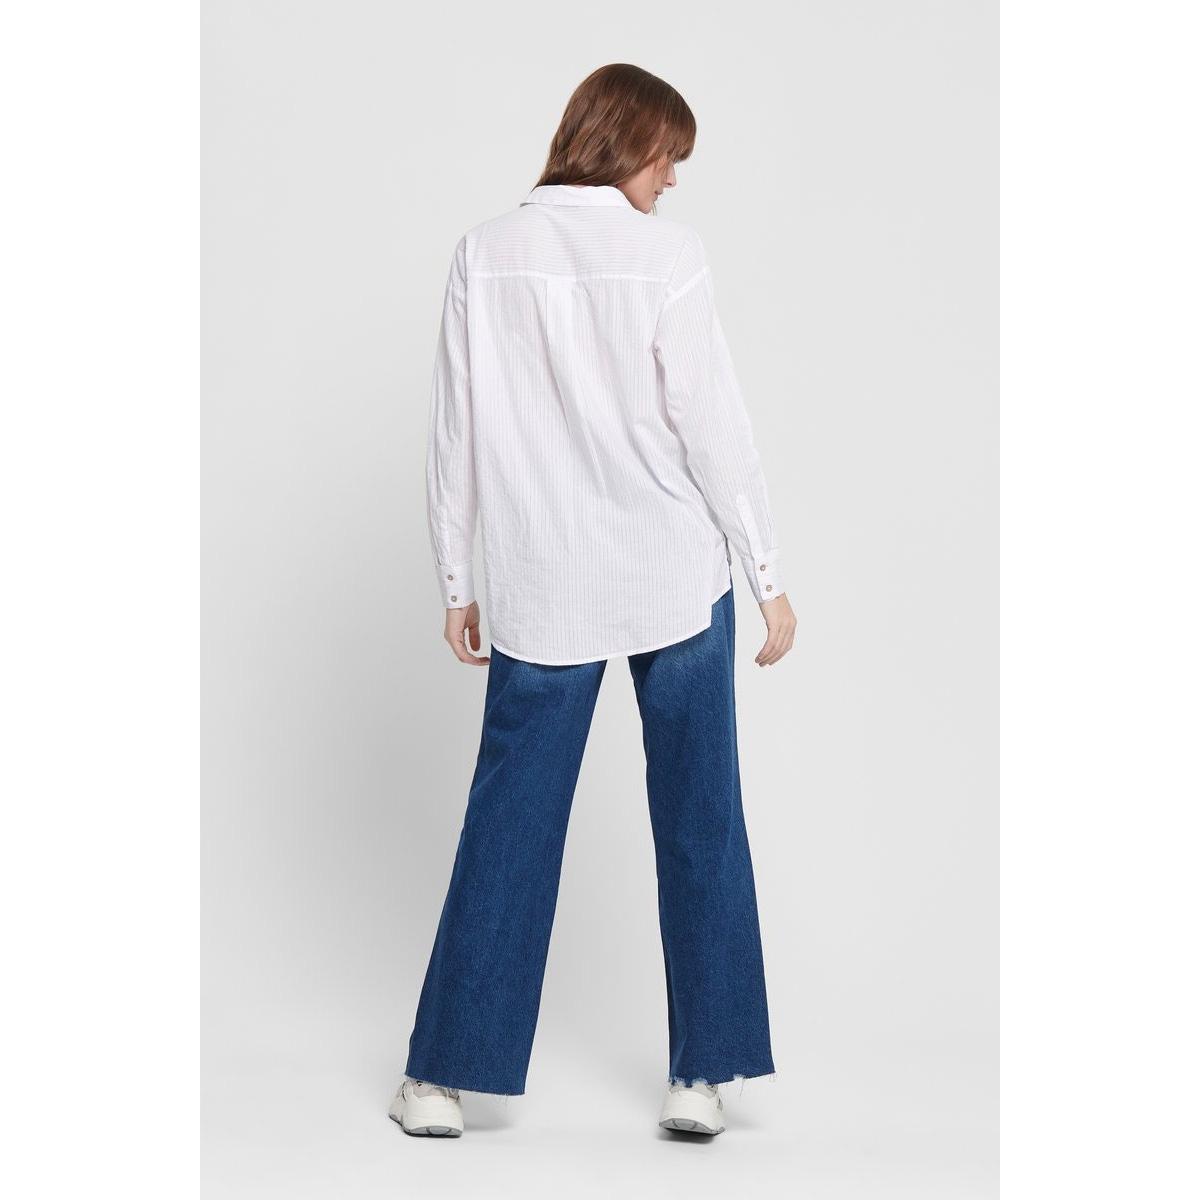 onlfcarry life l/s shirt wvn 15173492 only blouse white